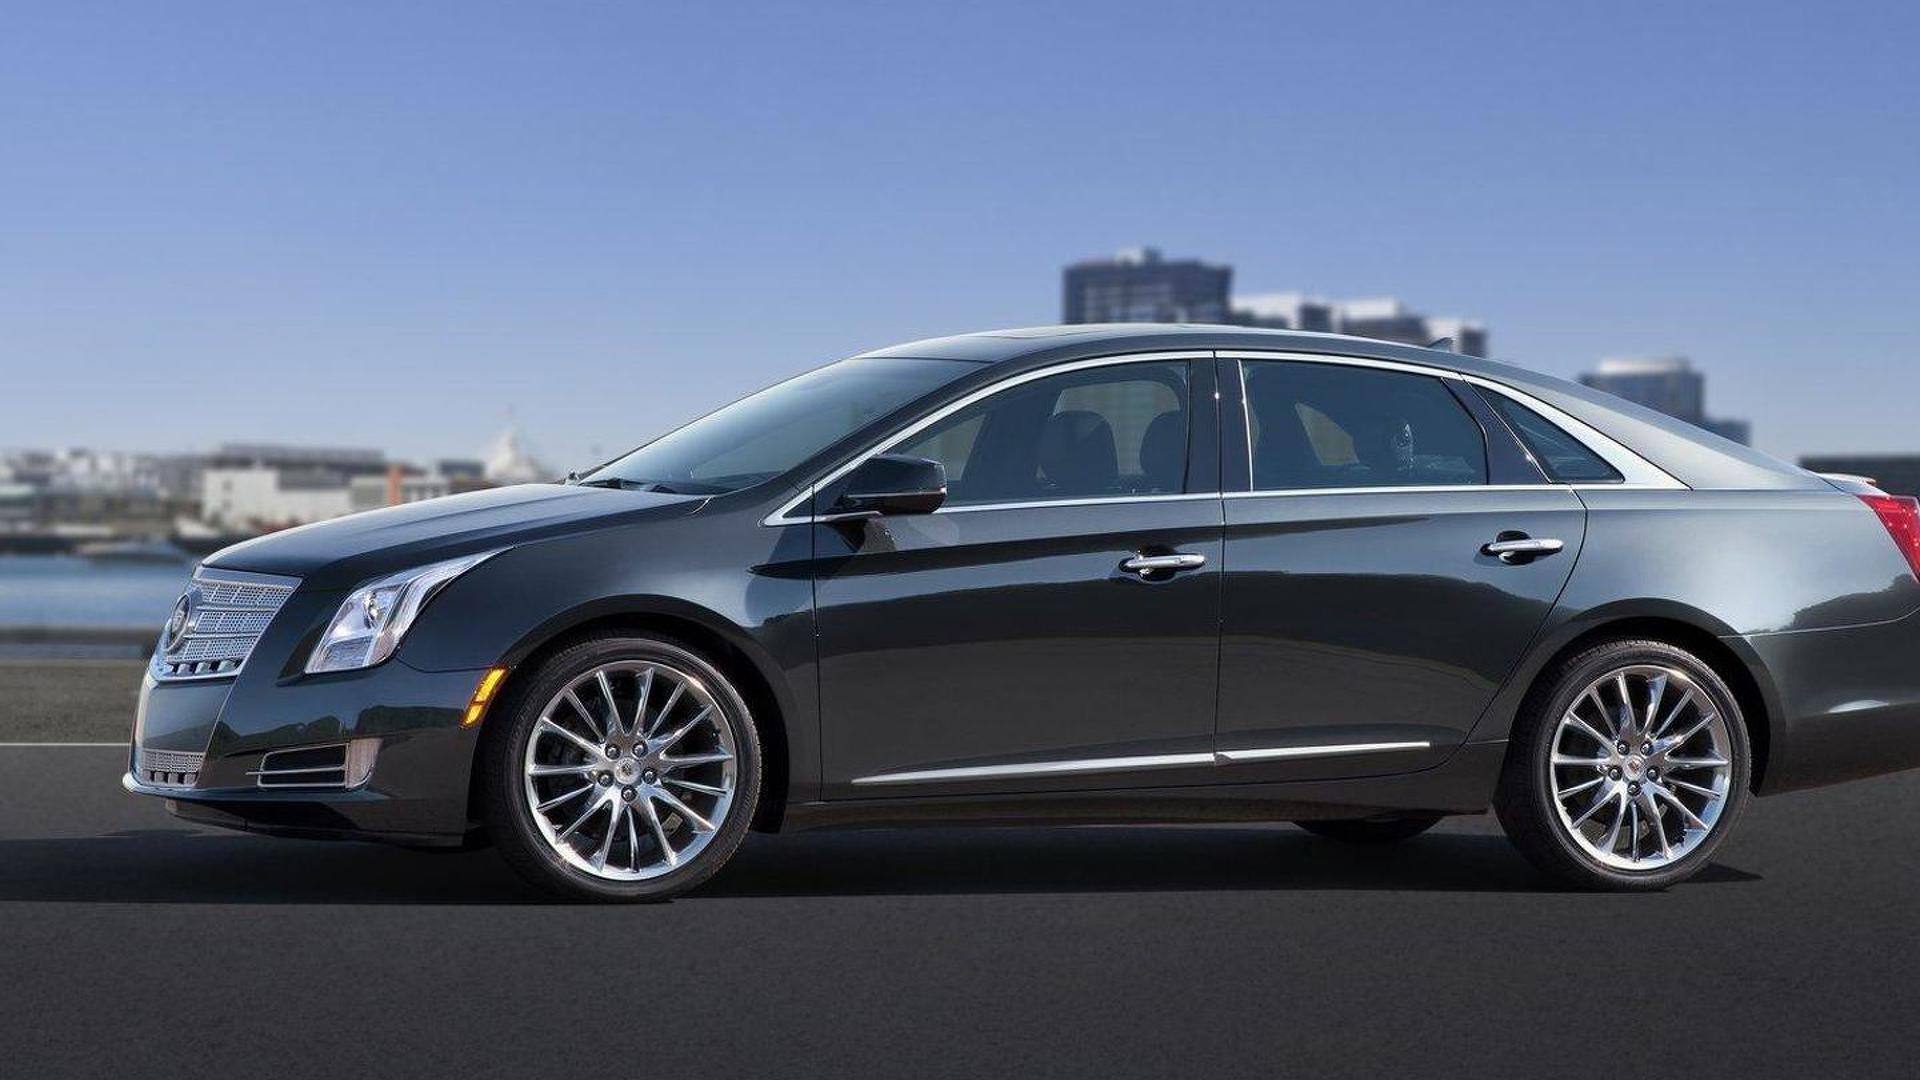 Cadillac XTS livery sedan announced